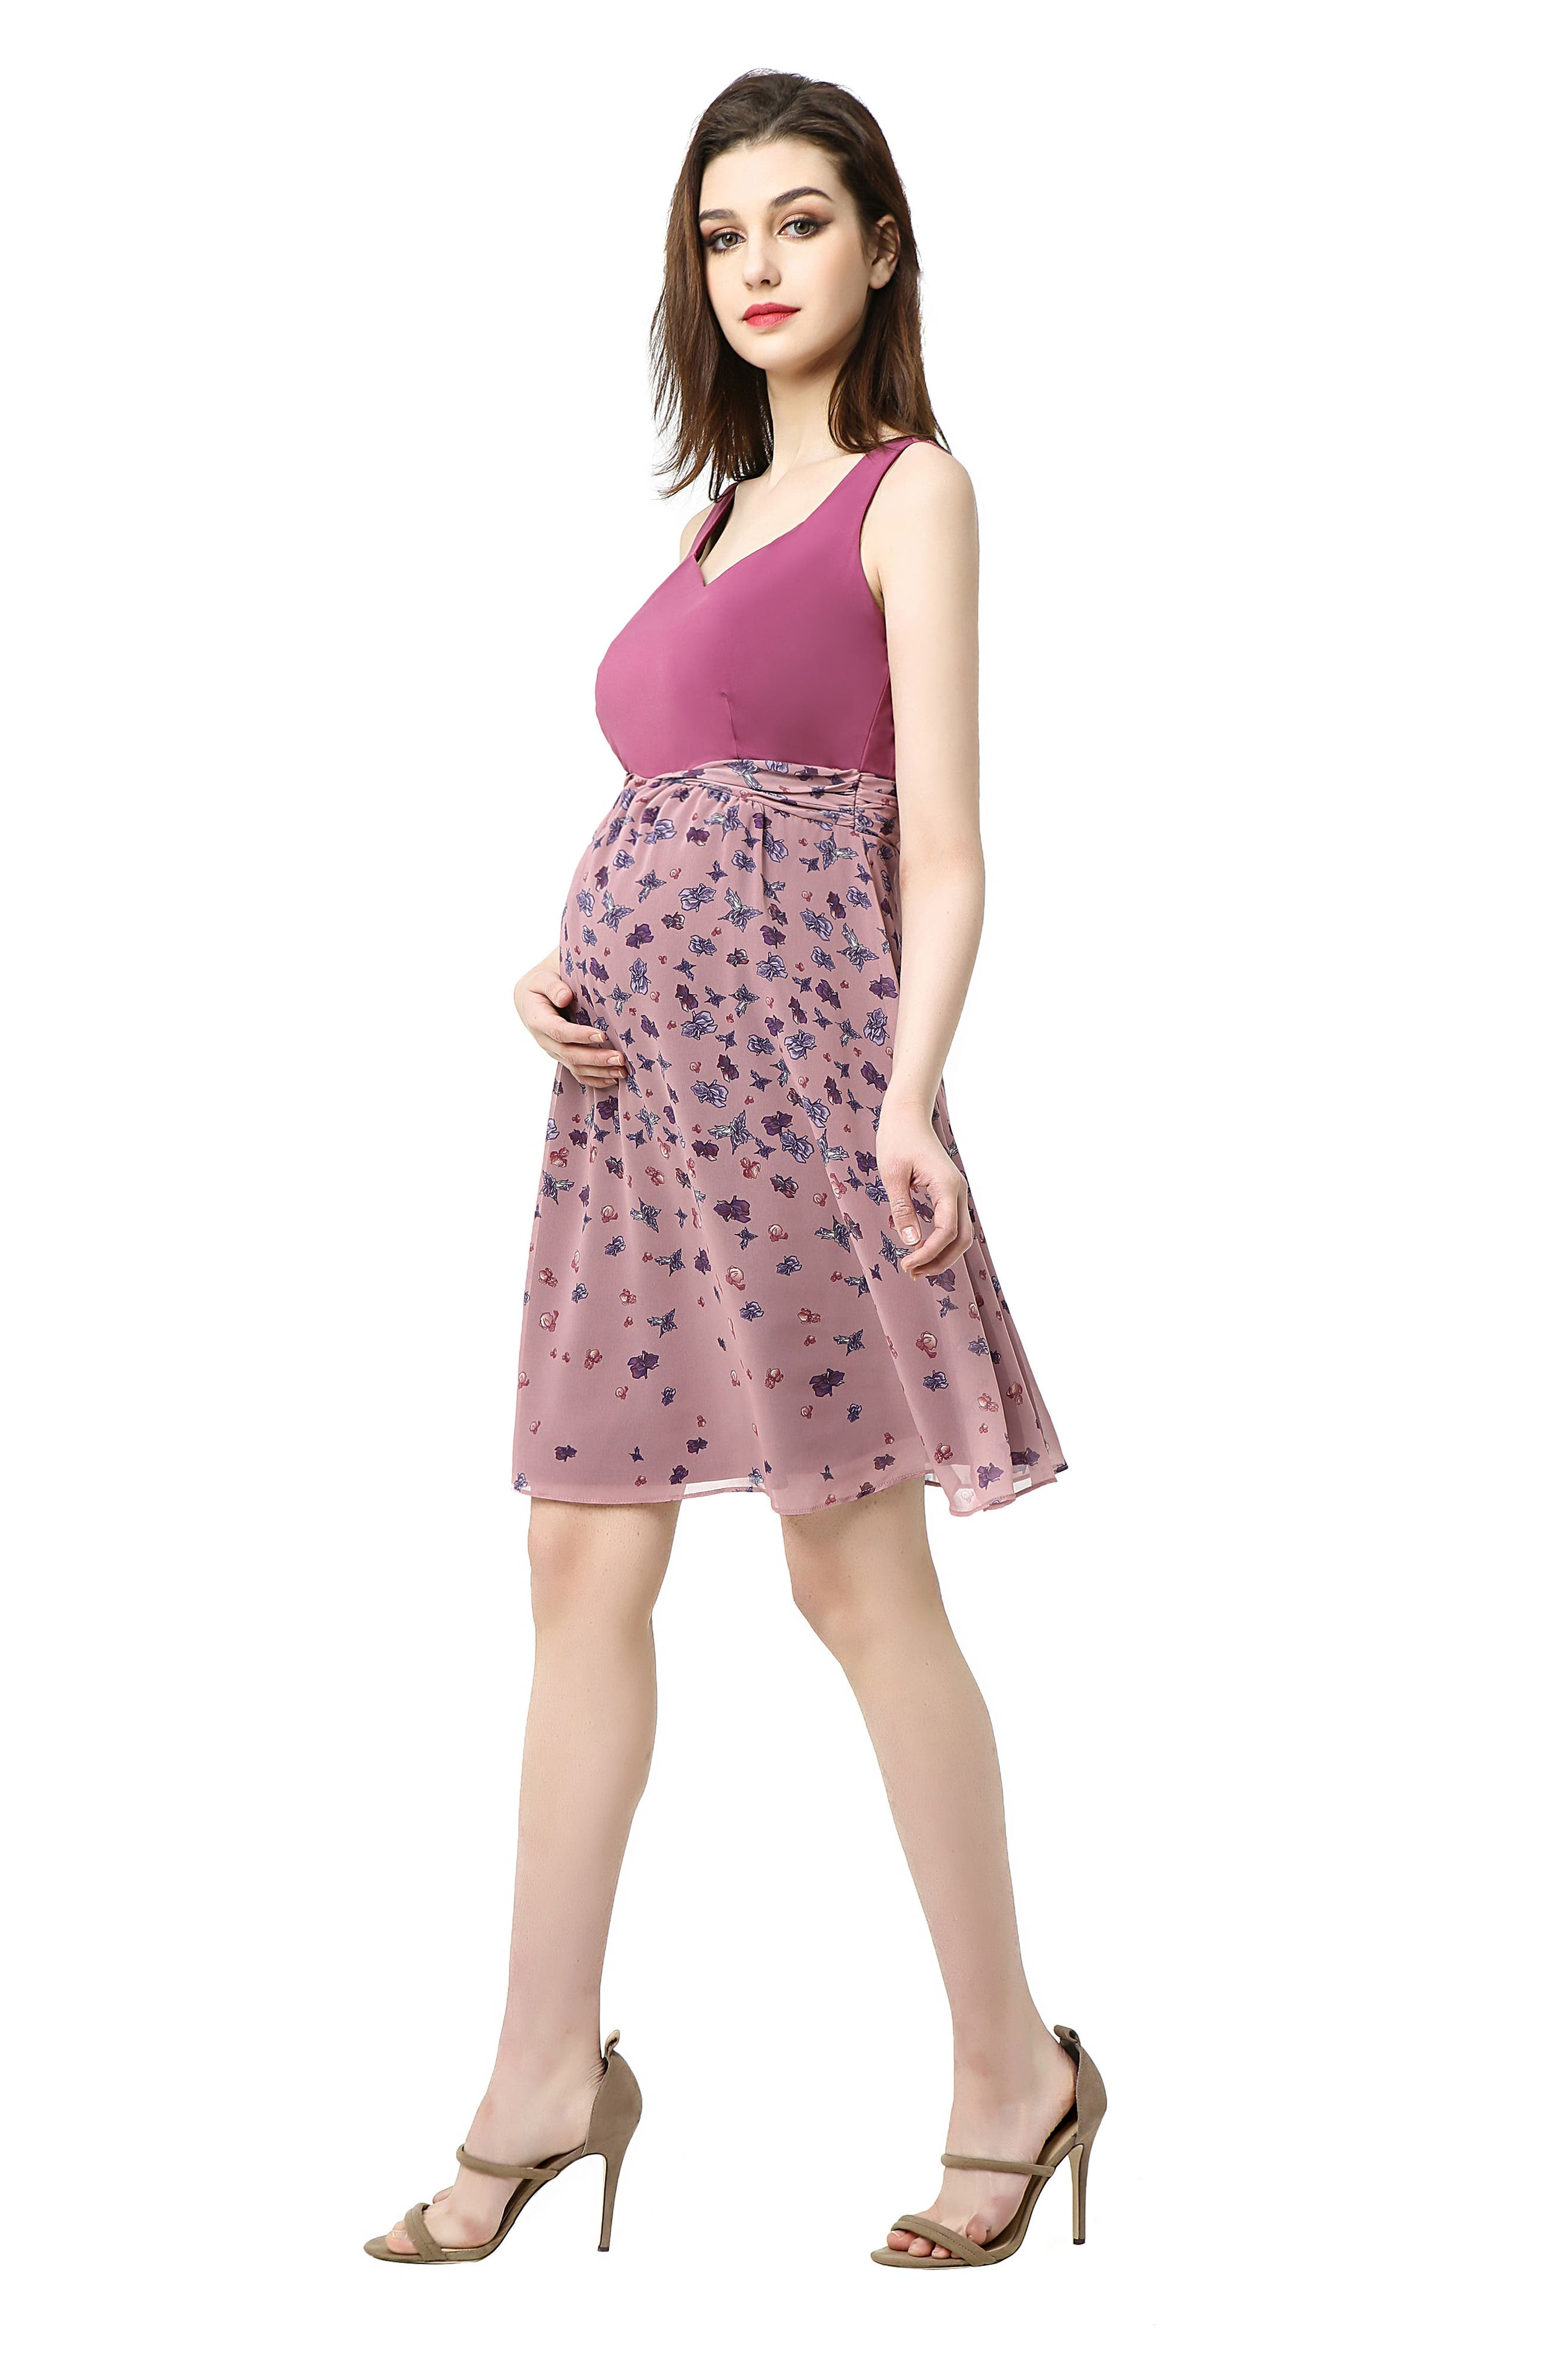 Libby Print Skirt Maternity Dress,                             Alternate thumbnail 4, color,                             ROSE PINK